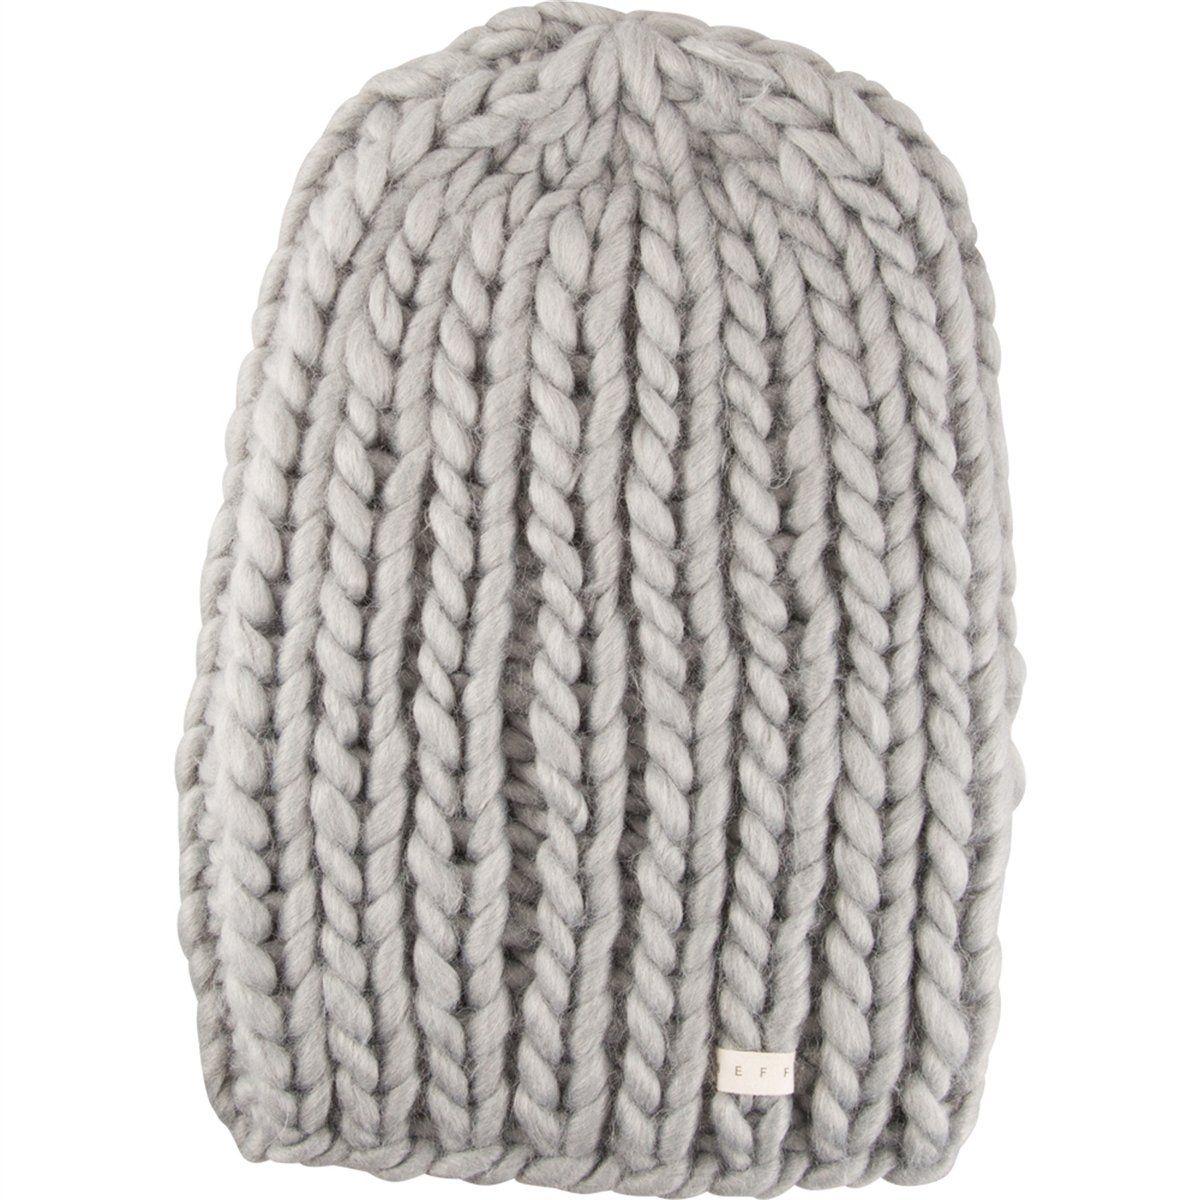 de5286394ea Neff Women s Cara Textured Beanie with Oversized Yarn